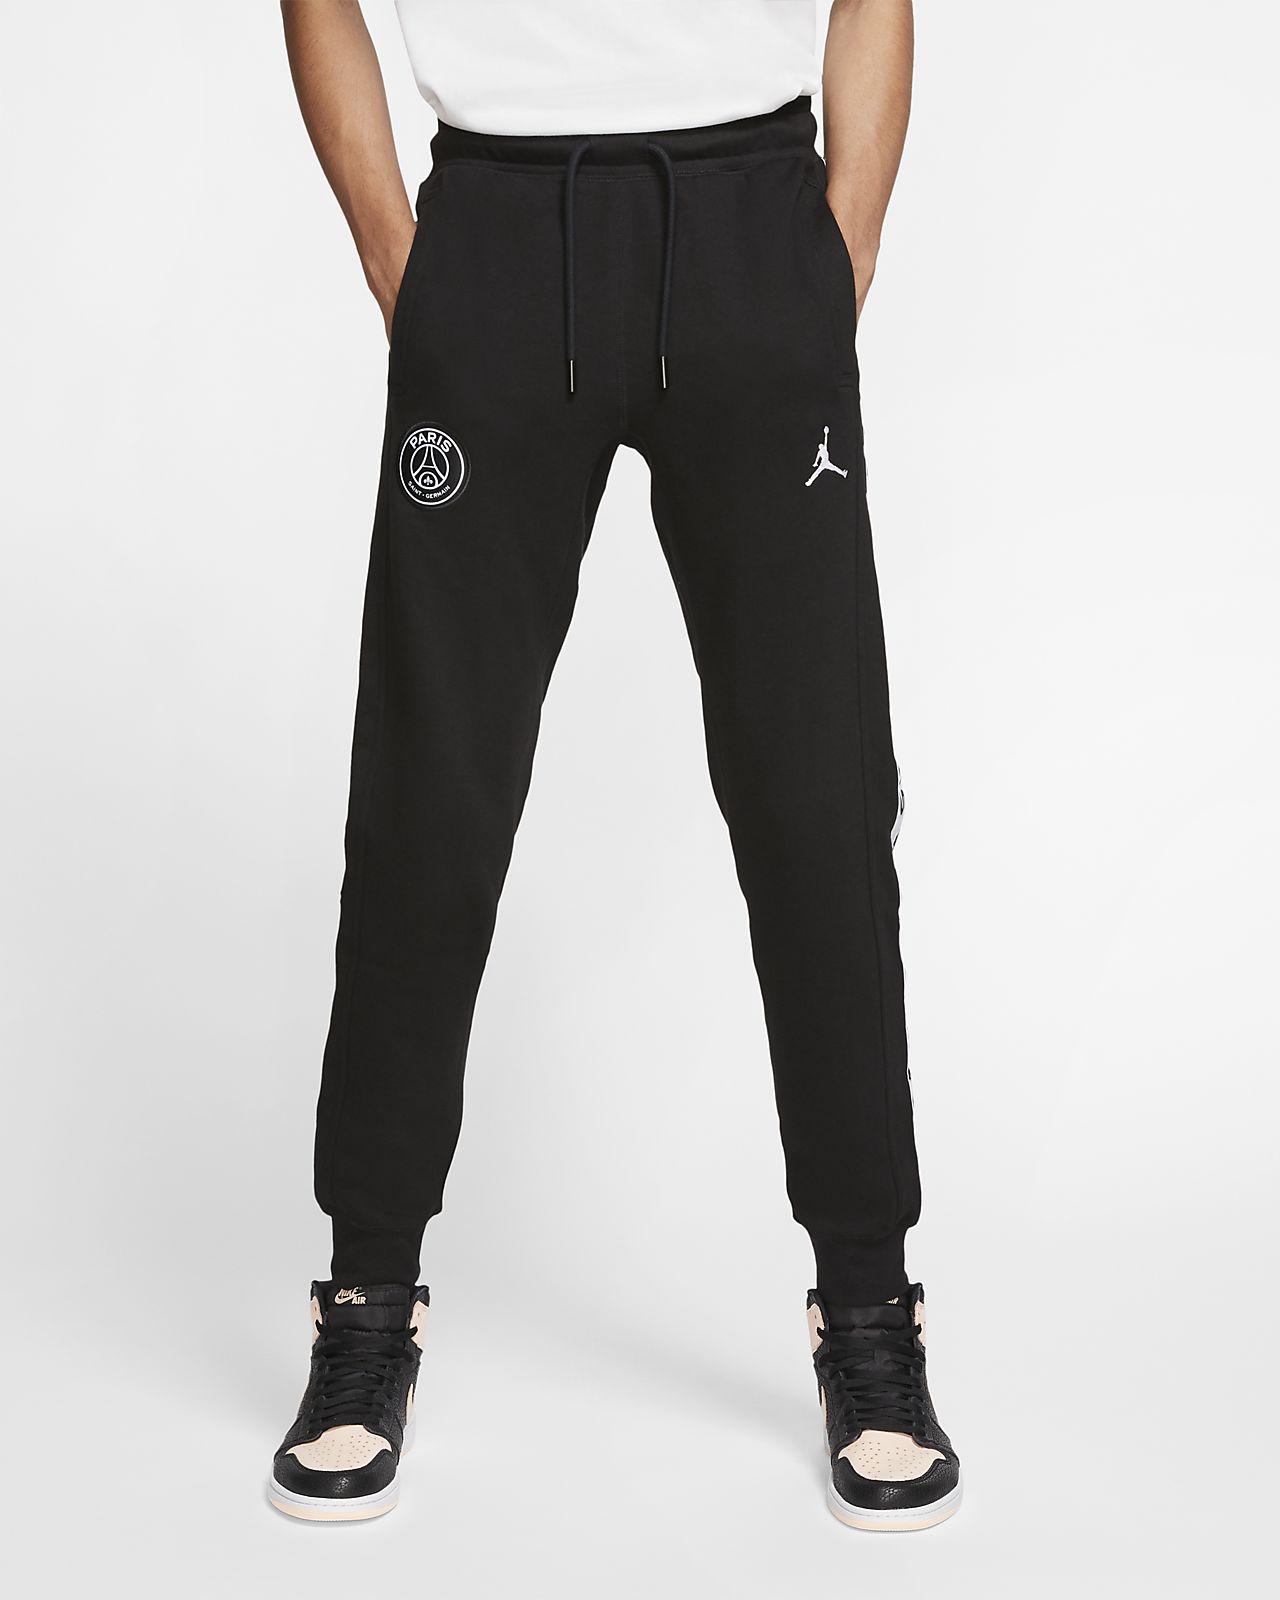 Pantalon en tissu Fleece Paris Saint-Germain